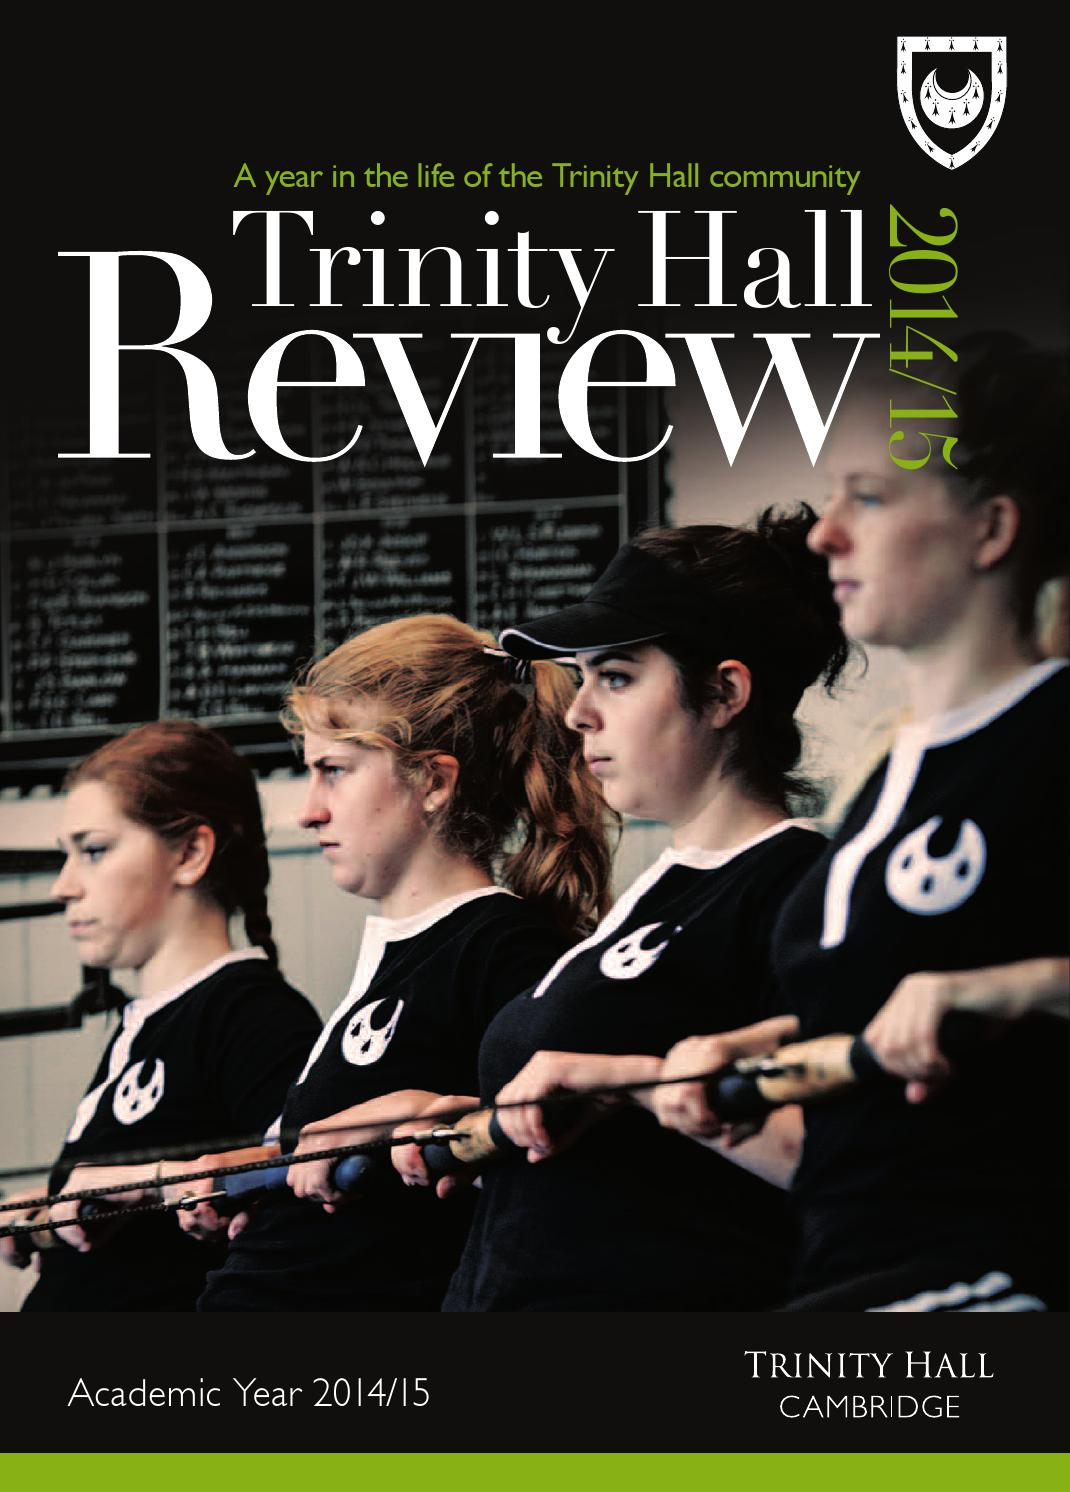 Trinity Hall Review 2014/15 by Trinity Hall - issuu